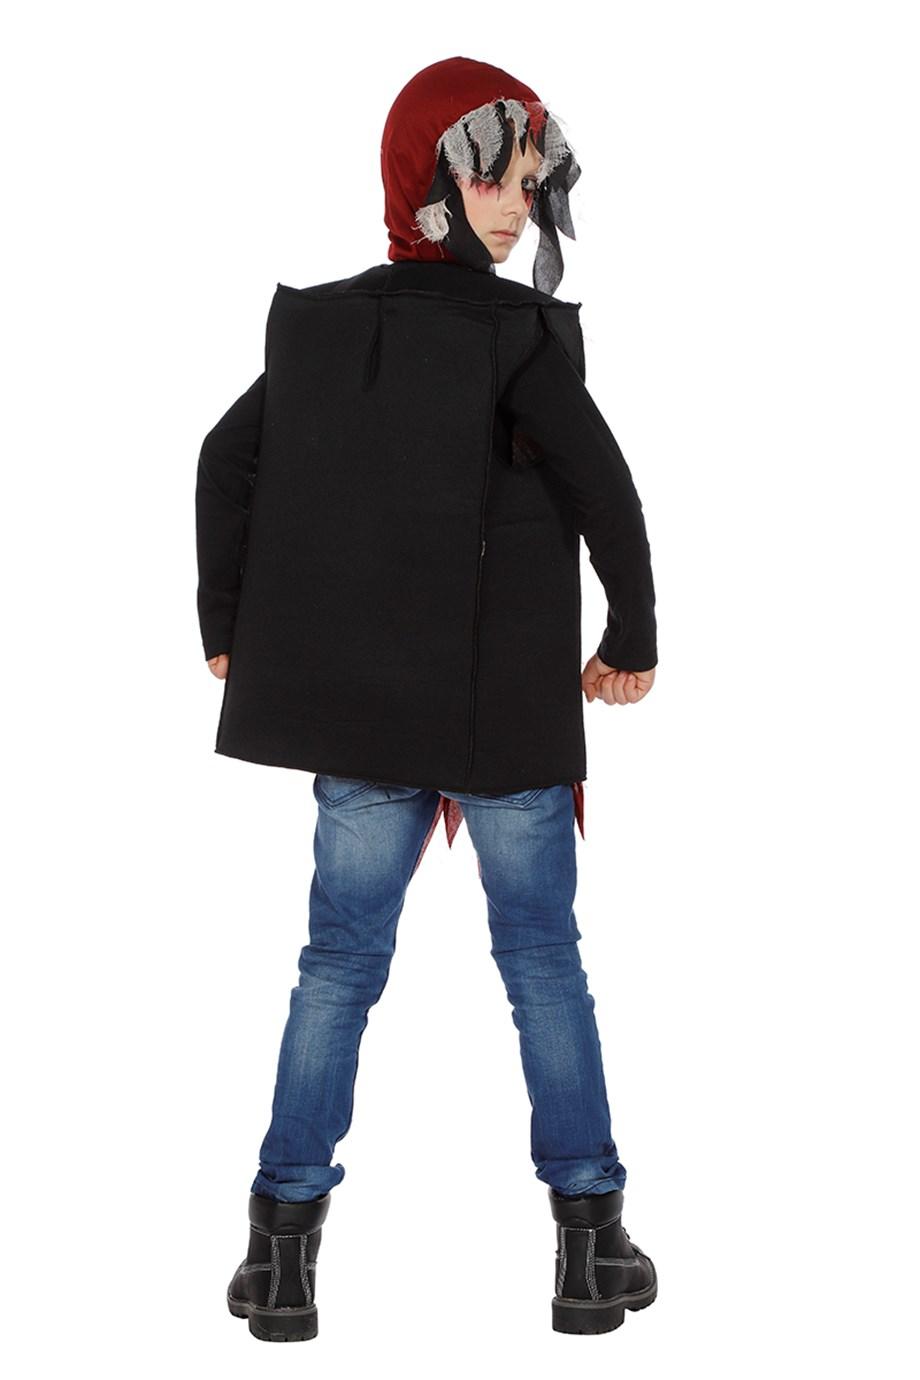 Hoody scary devil-259714